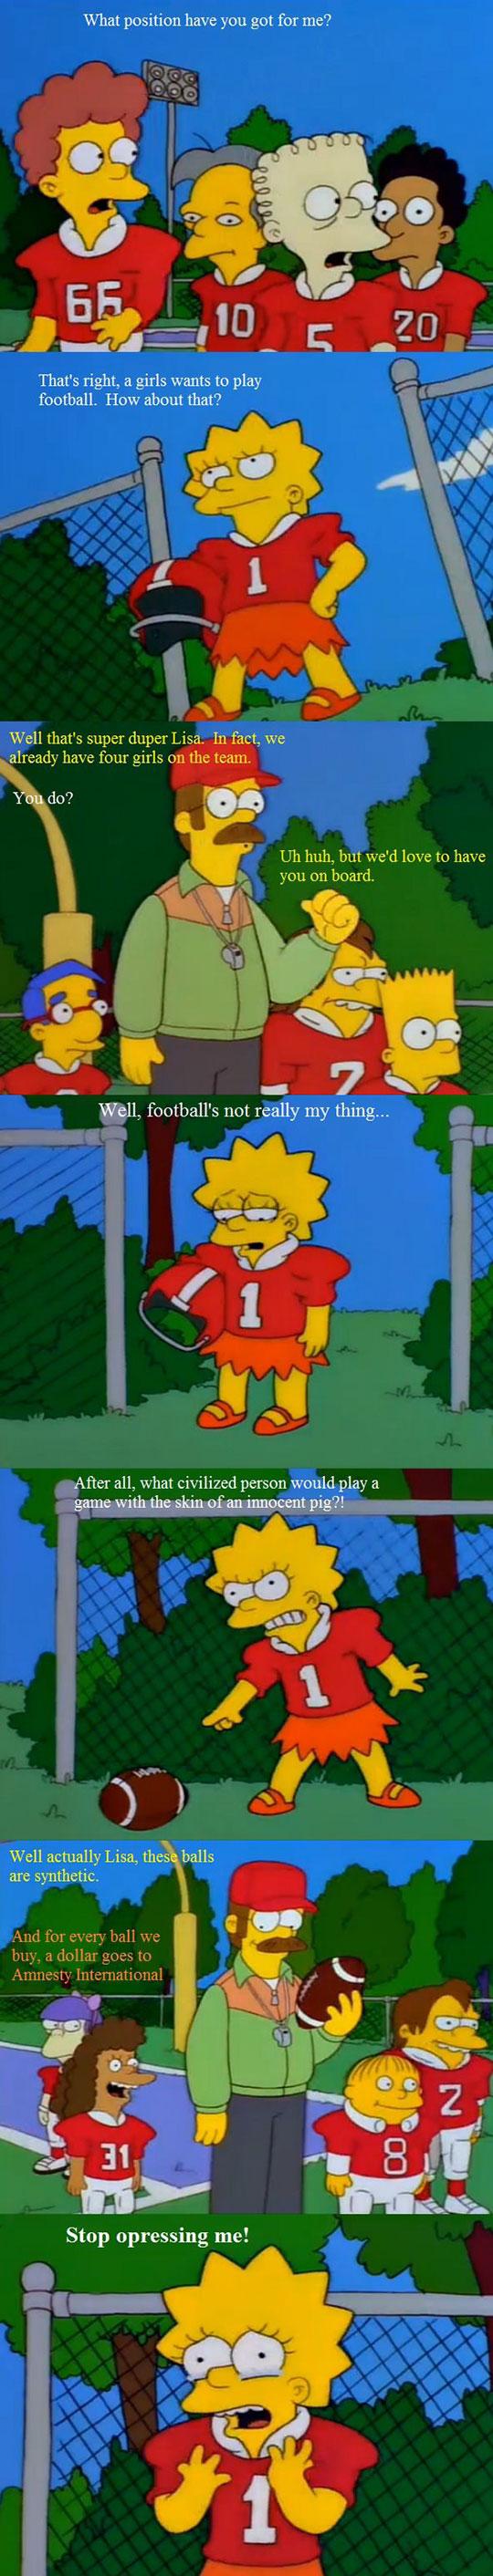 funny-Lisa-Simpson-football-girl-oppressed